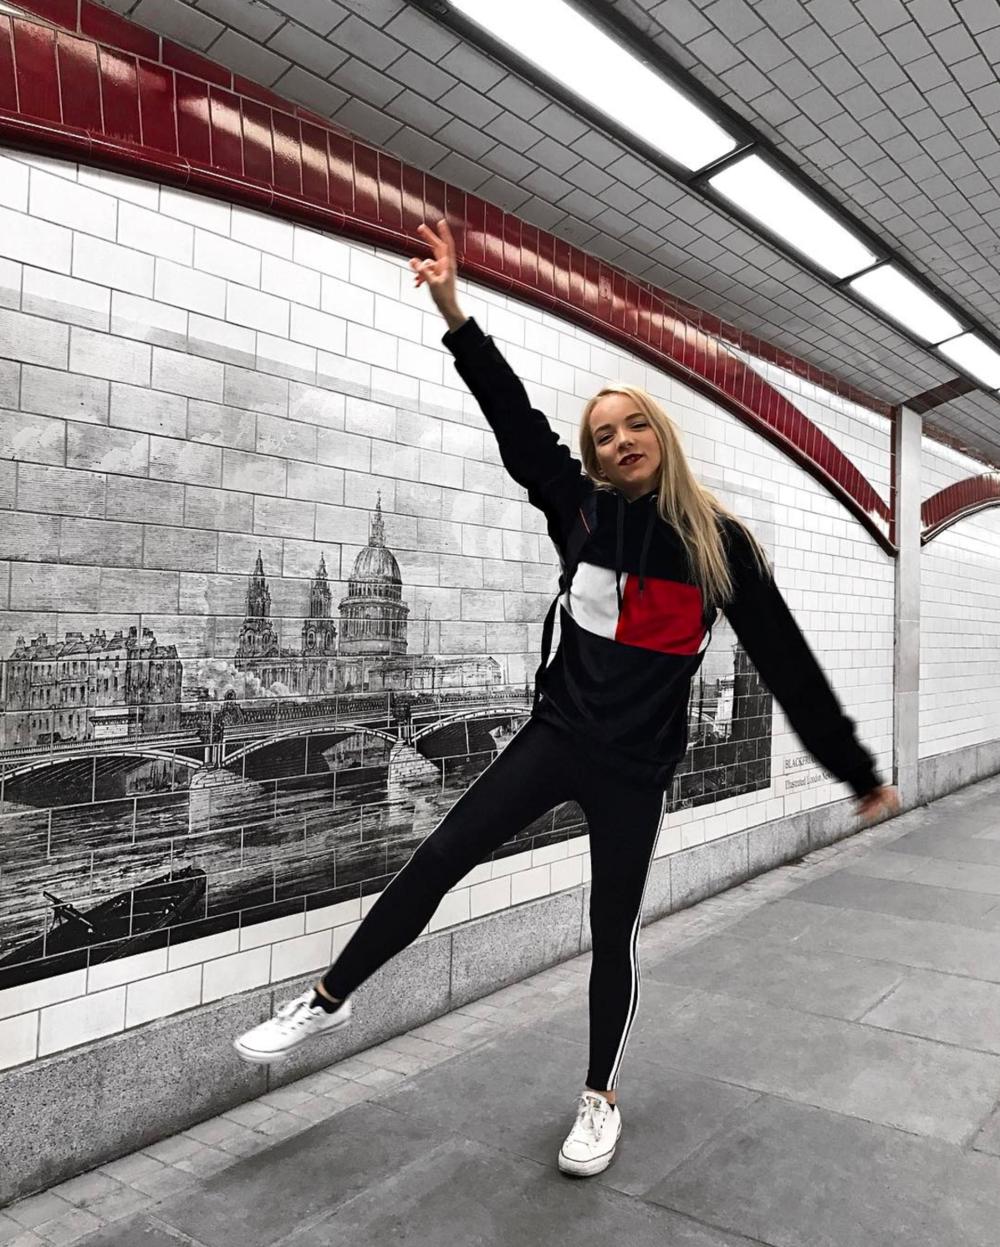 tommy travel style on the go fashion influencer instagram miasoarez